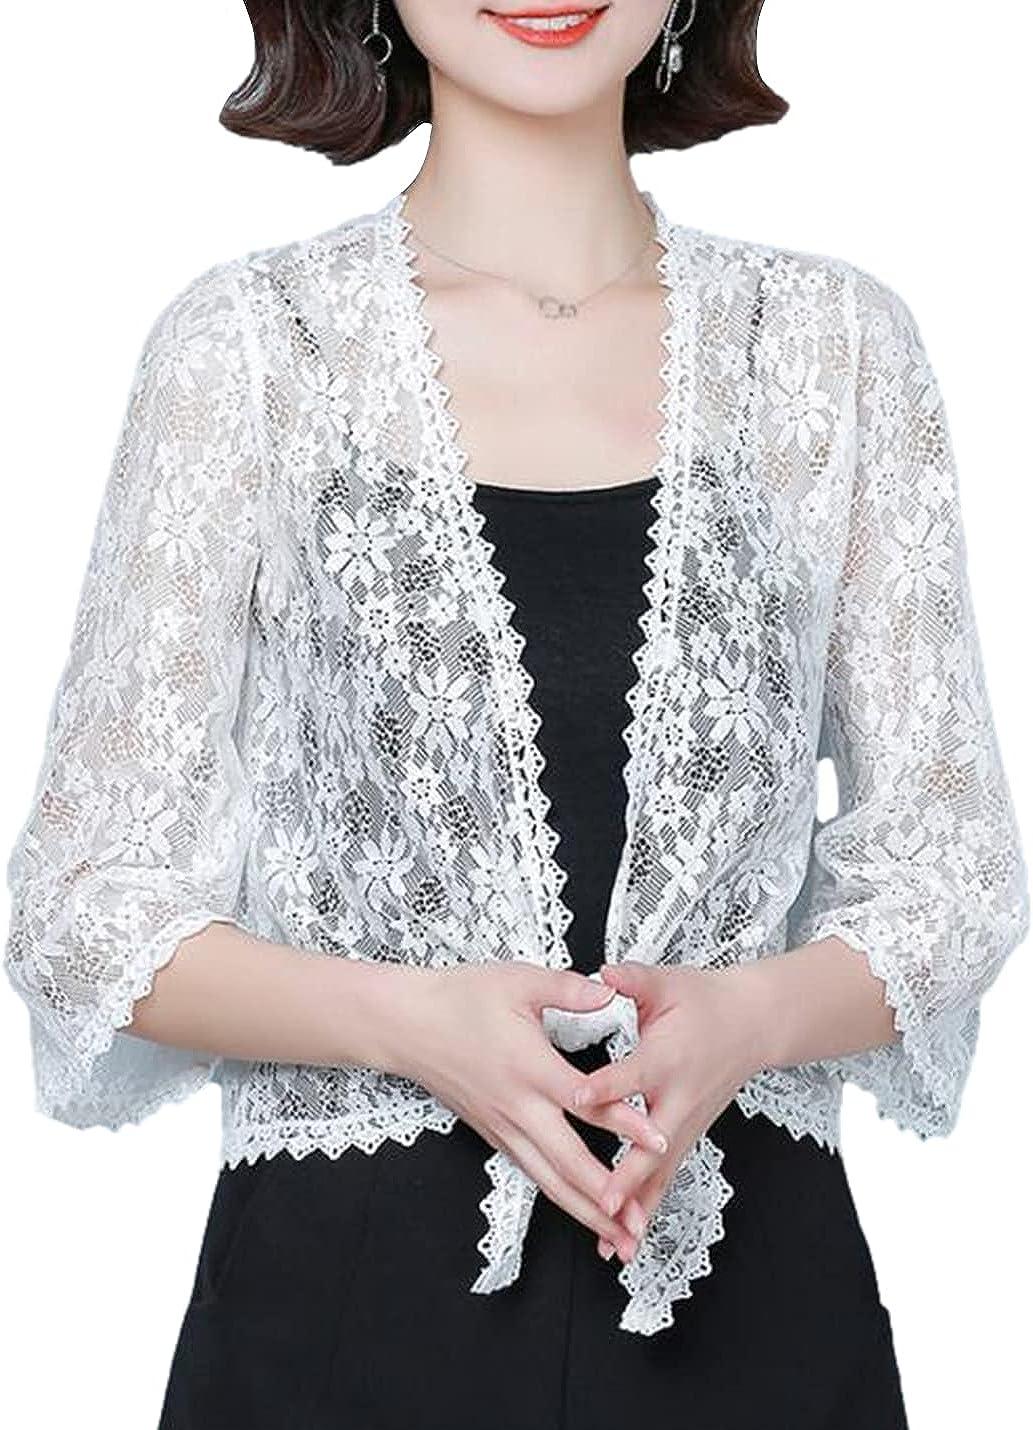 Xishiloft Women's 3/4 Sleeve Lace Crochet Cardigan Cardigan Casual Shrug Sling Top